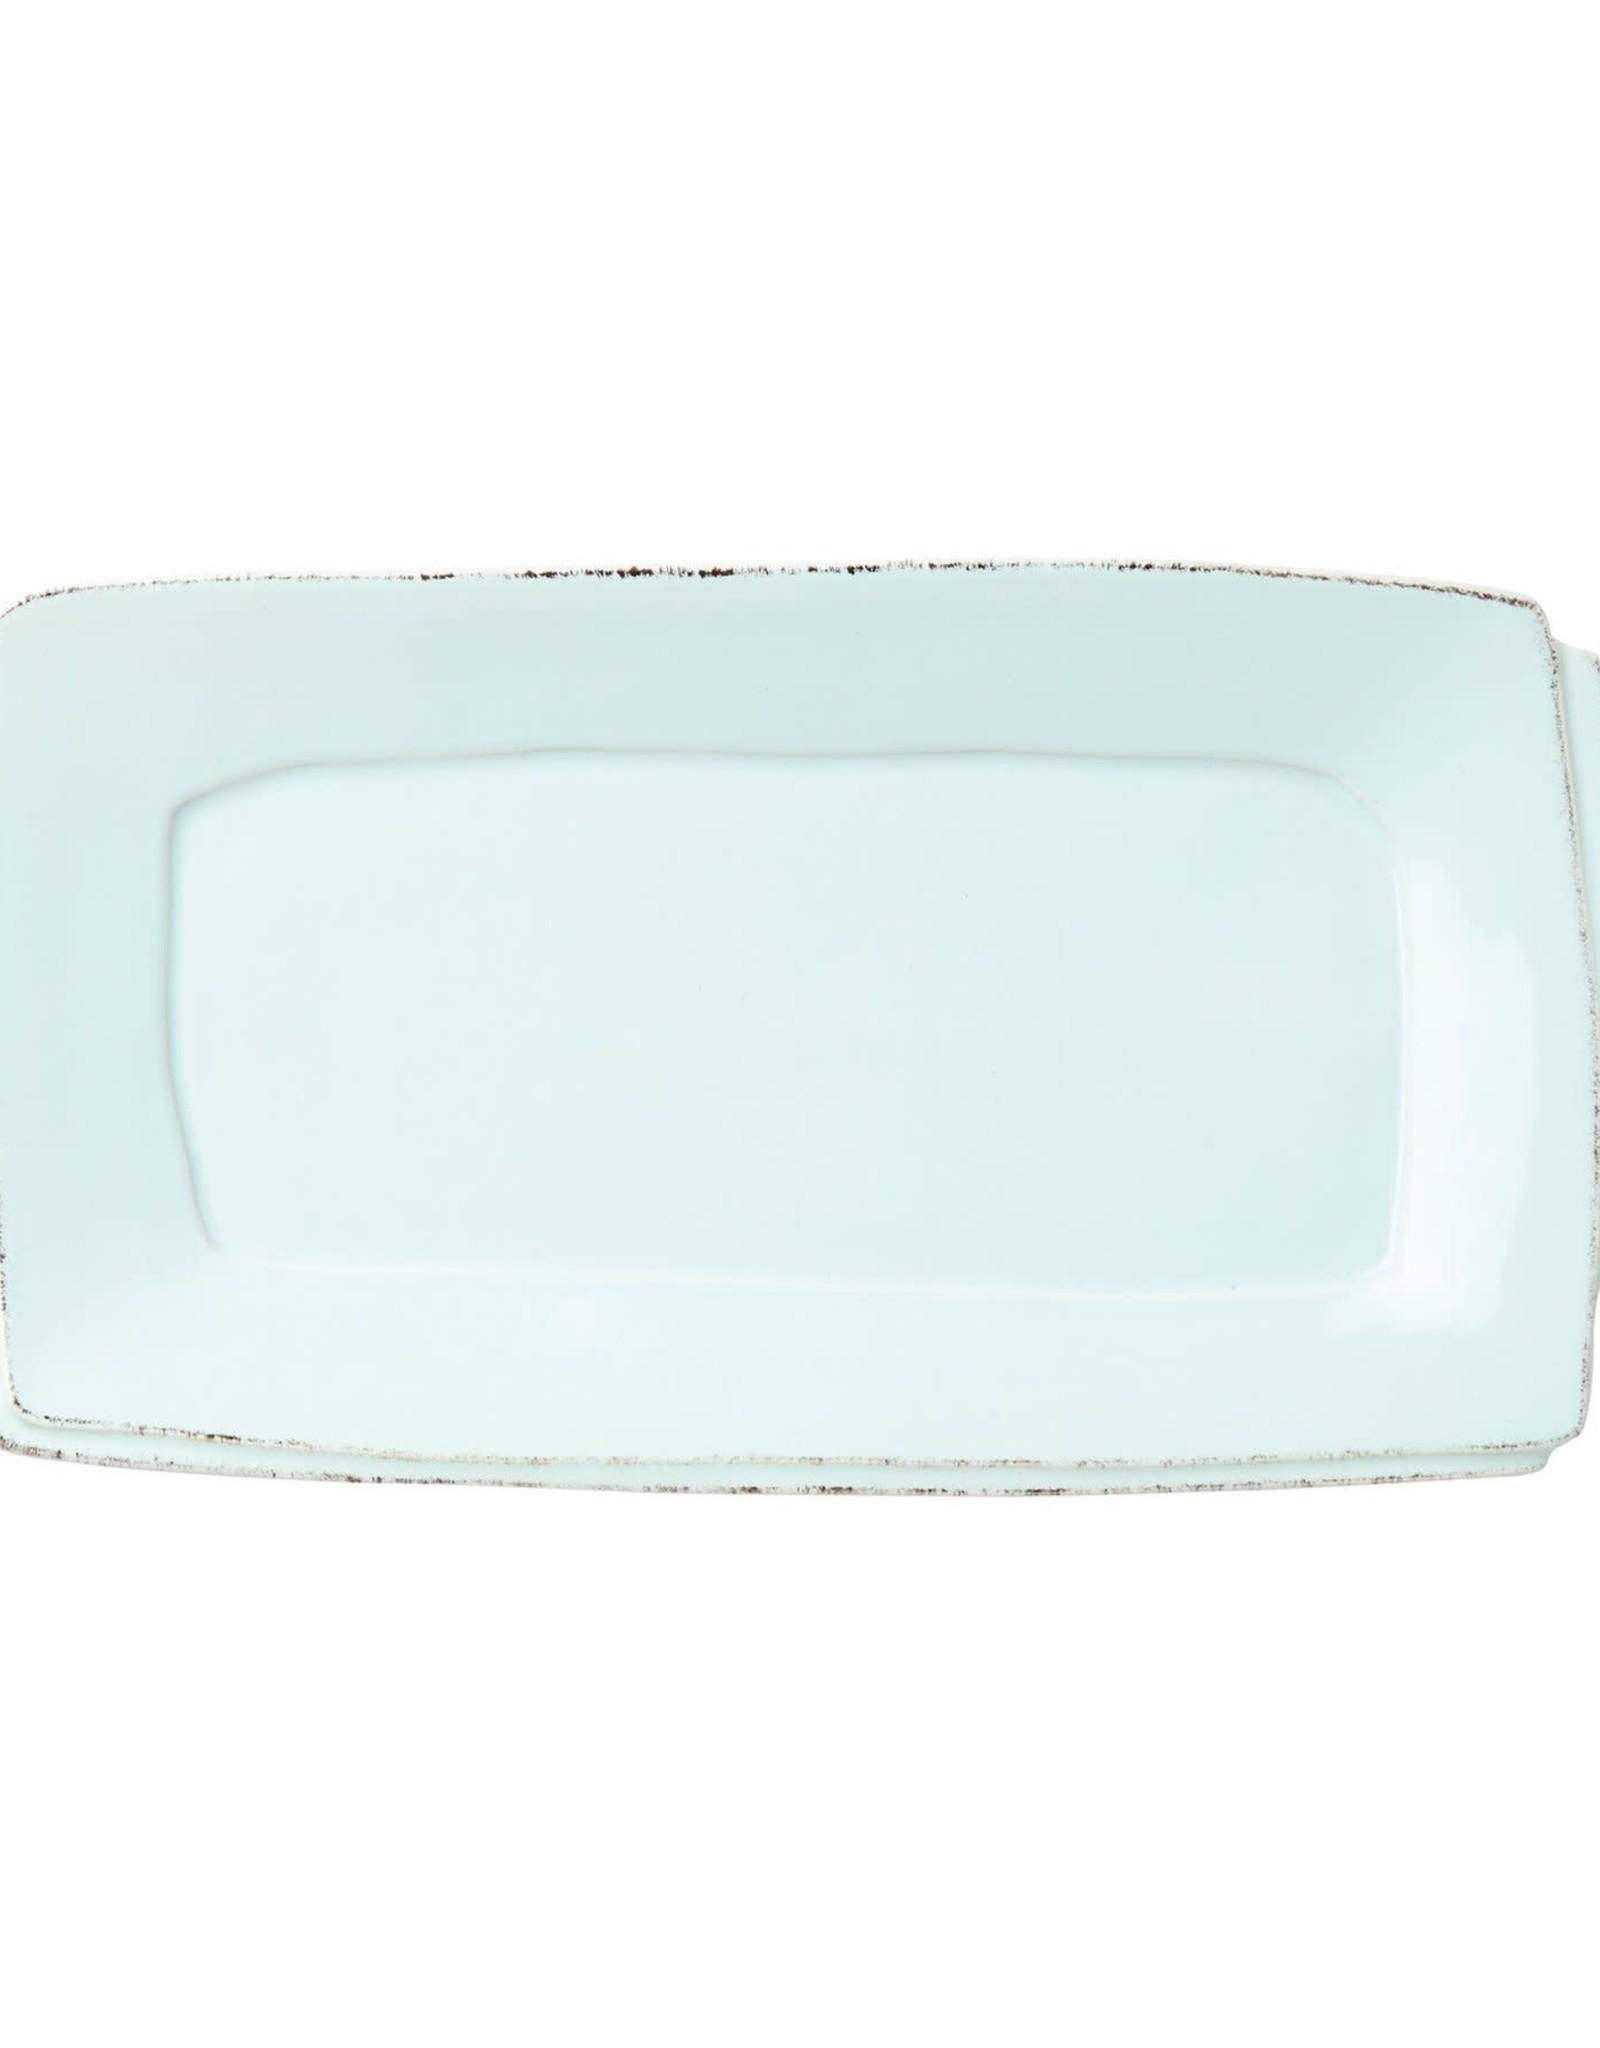 Vietri Lastra Handled Rectangular Platter Aqua